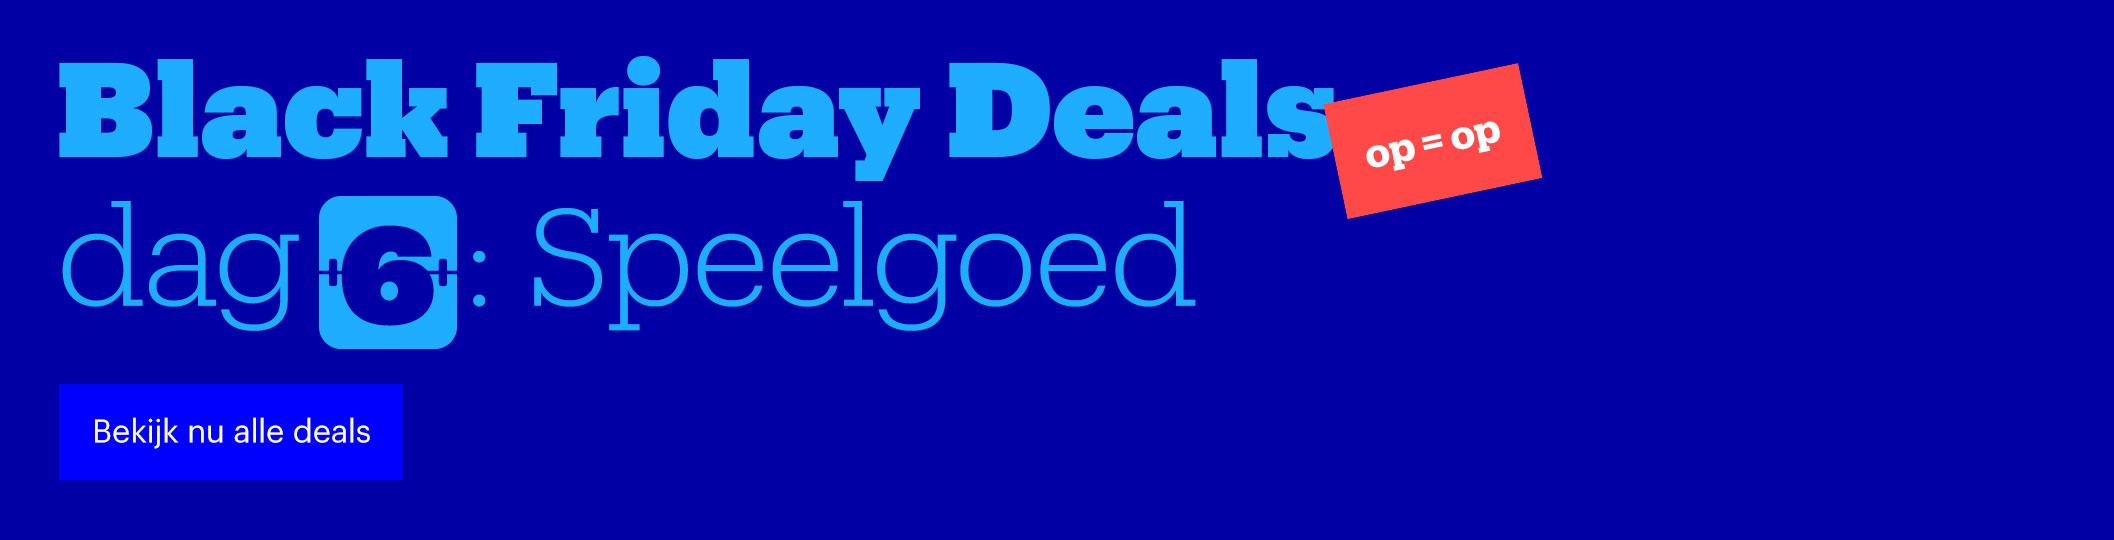 Black Friday deals | Dag 6: Speelgoed